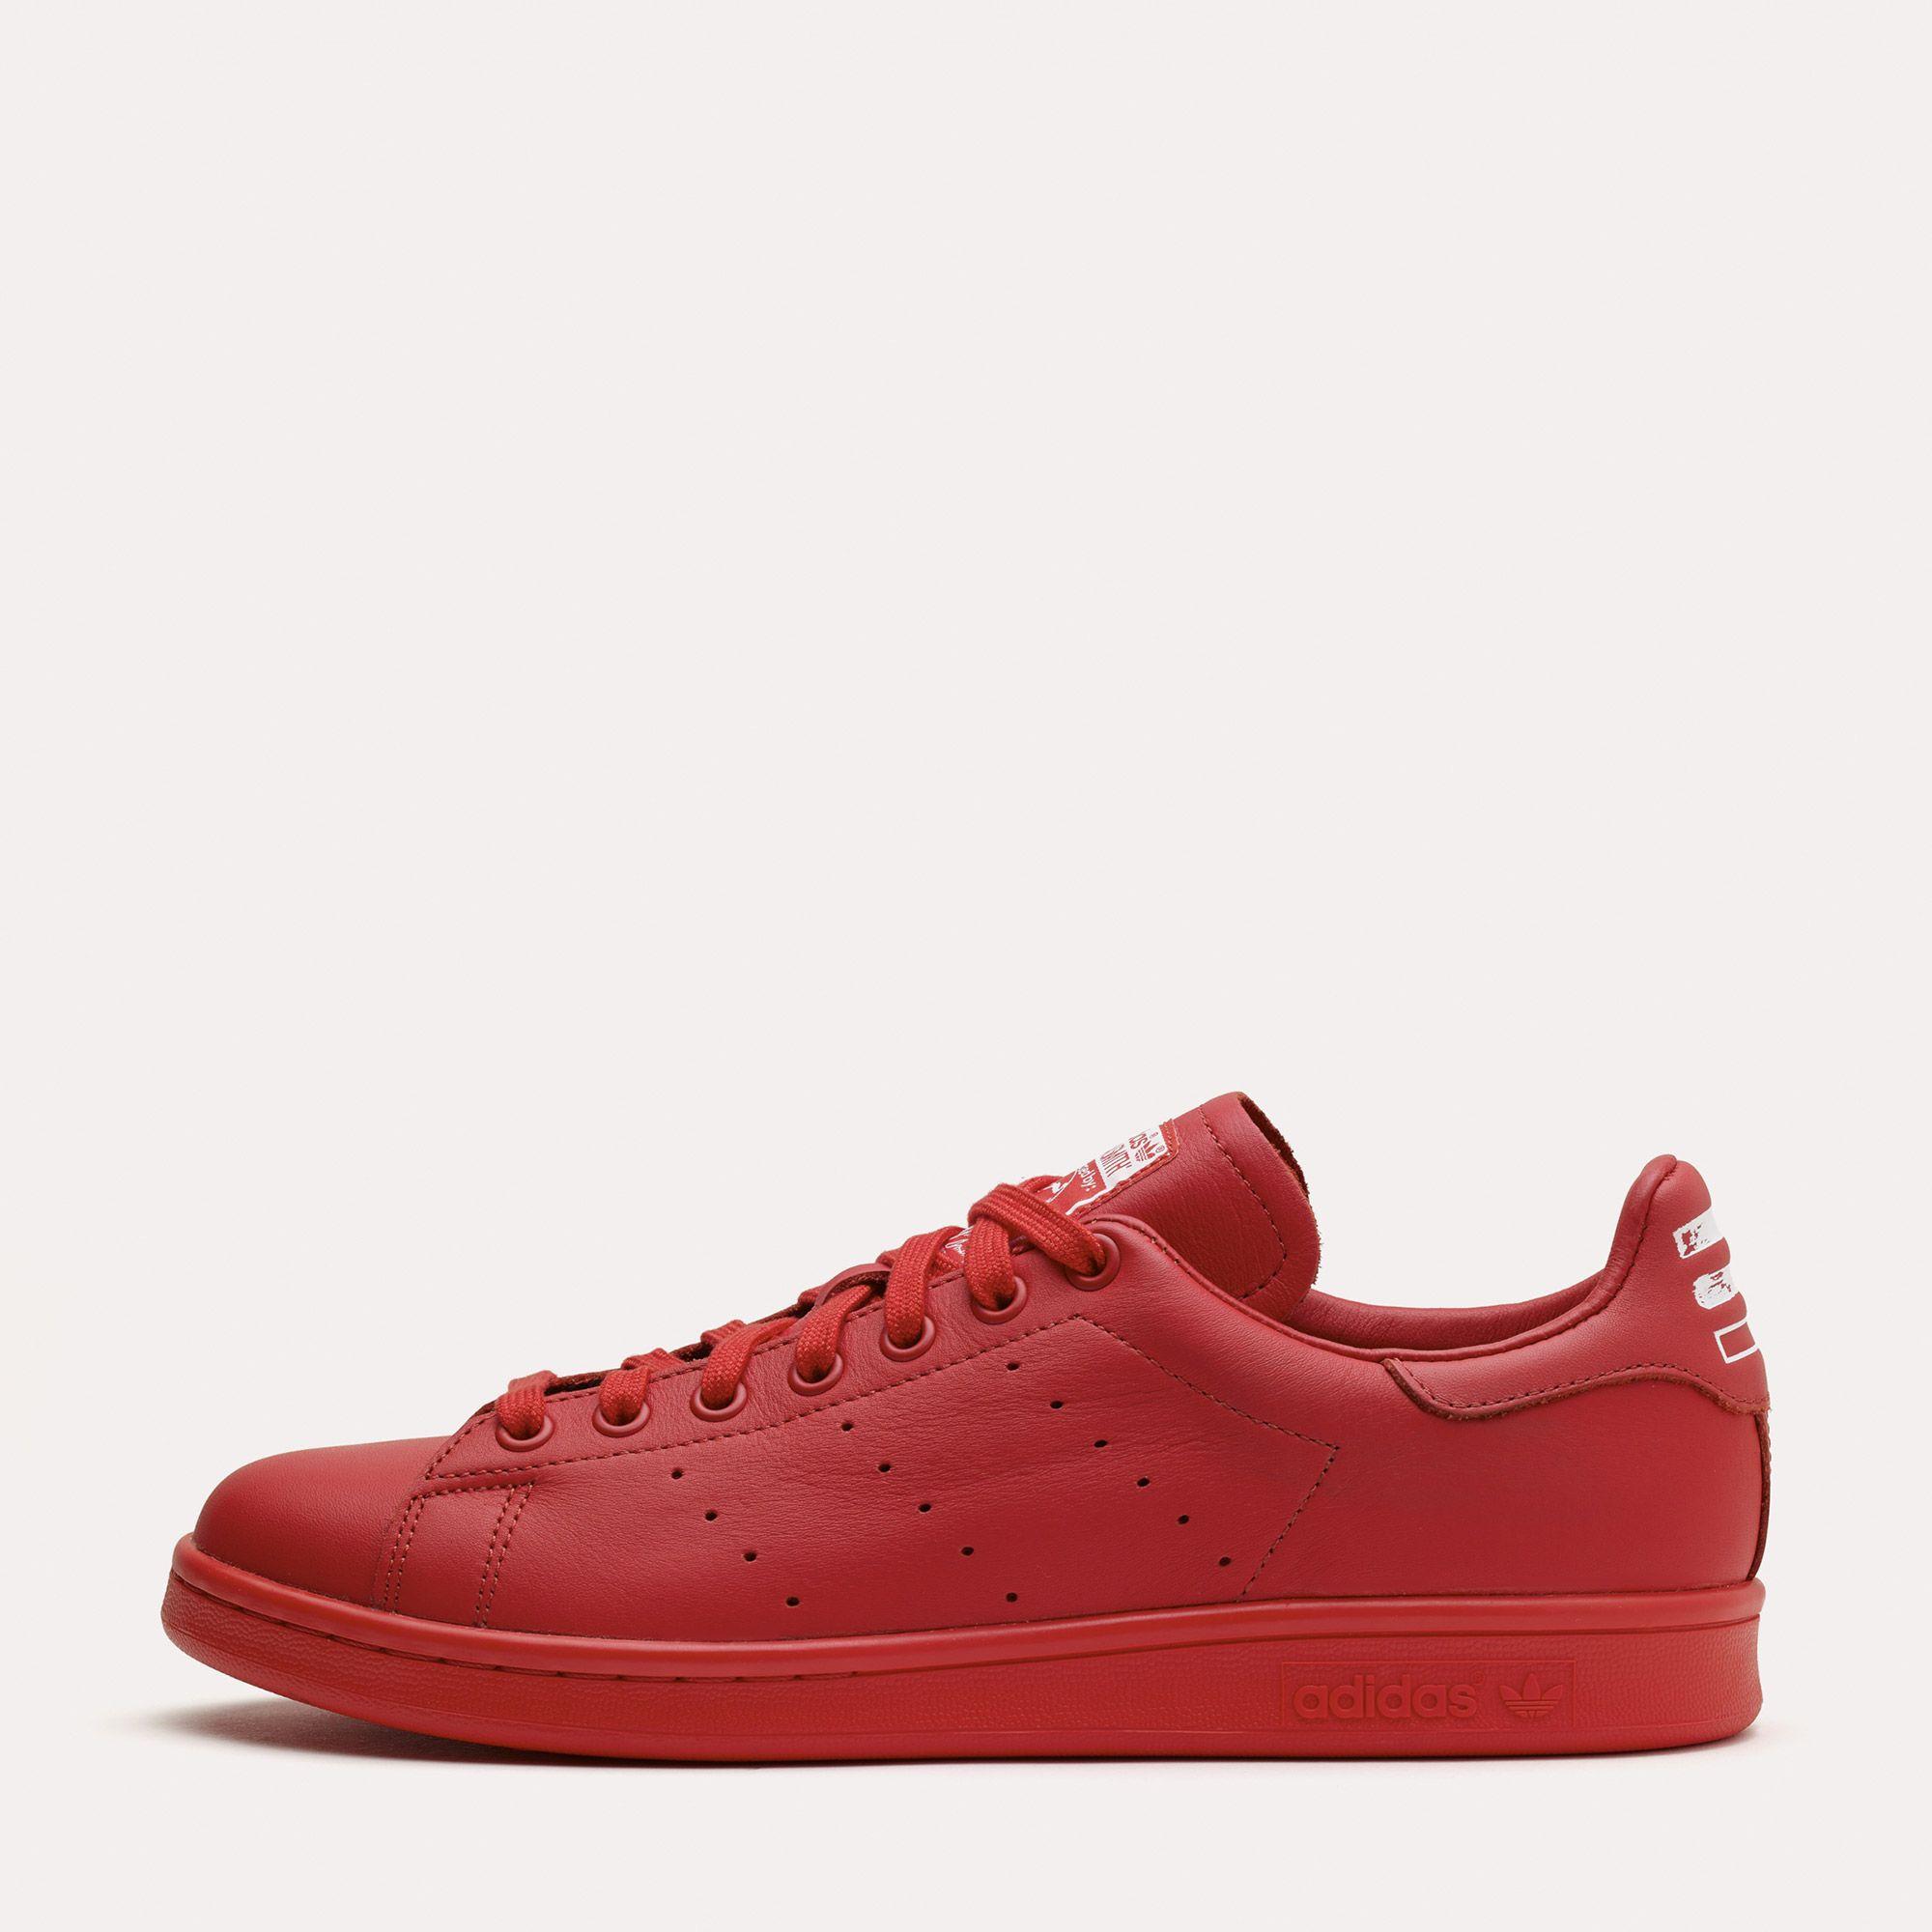 1f401b87a9e adidas Pharrell Williams Stan Smith Solid Shoes